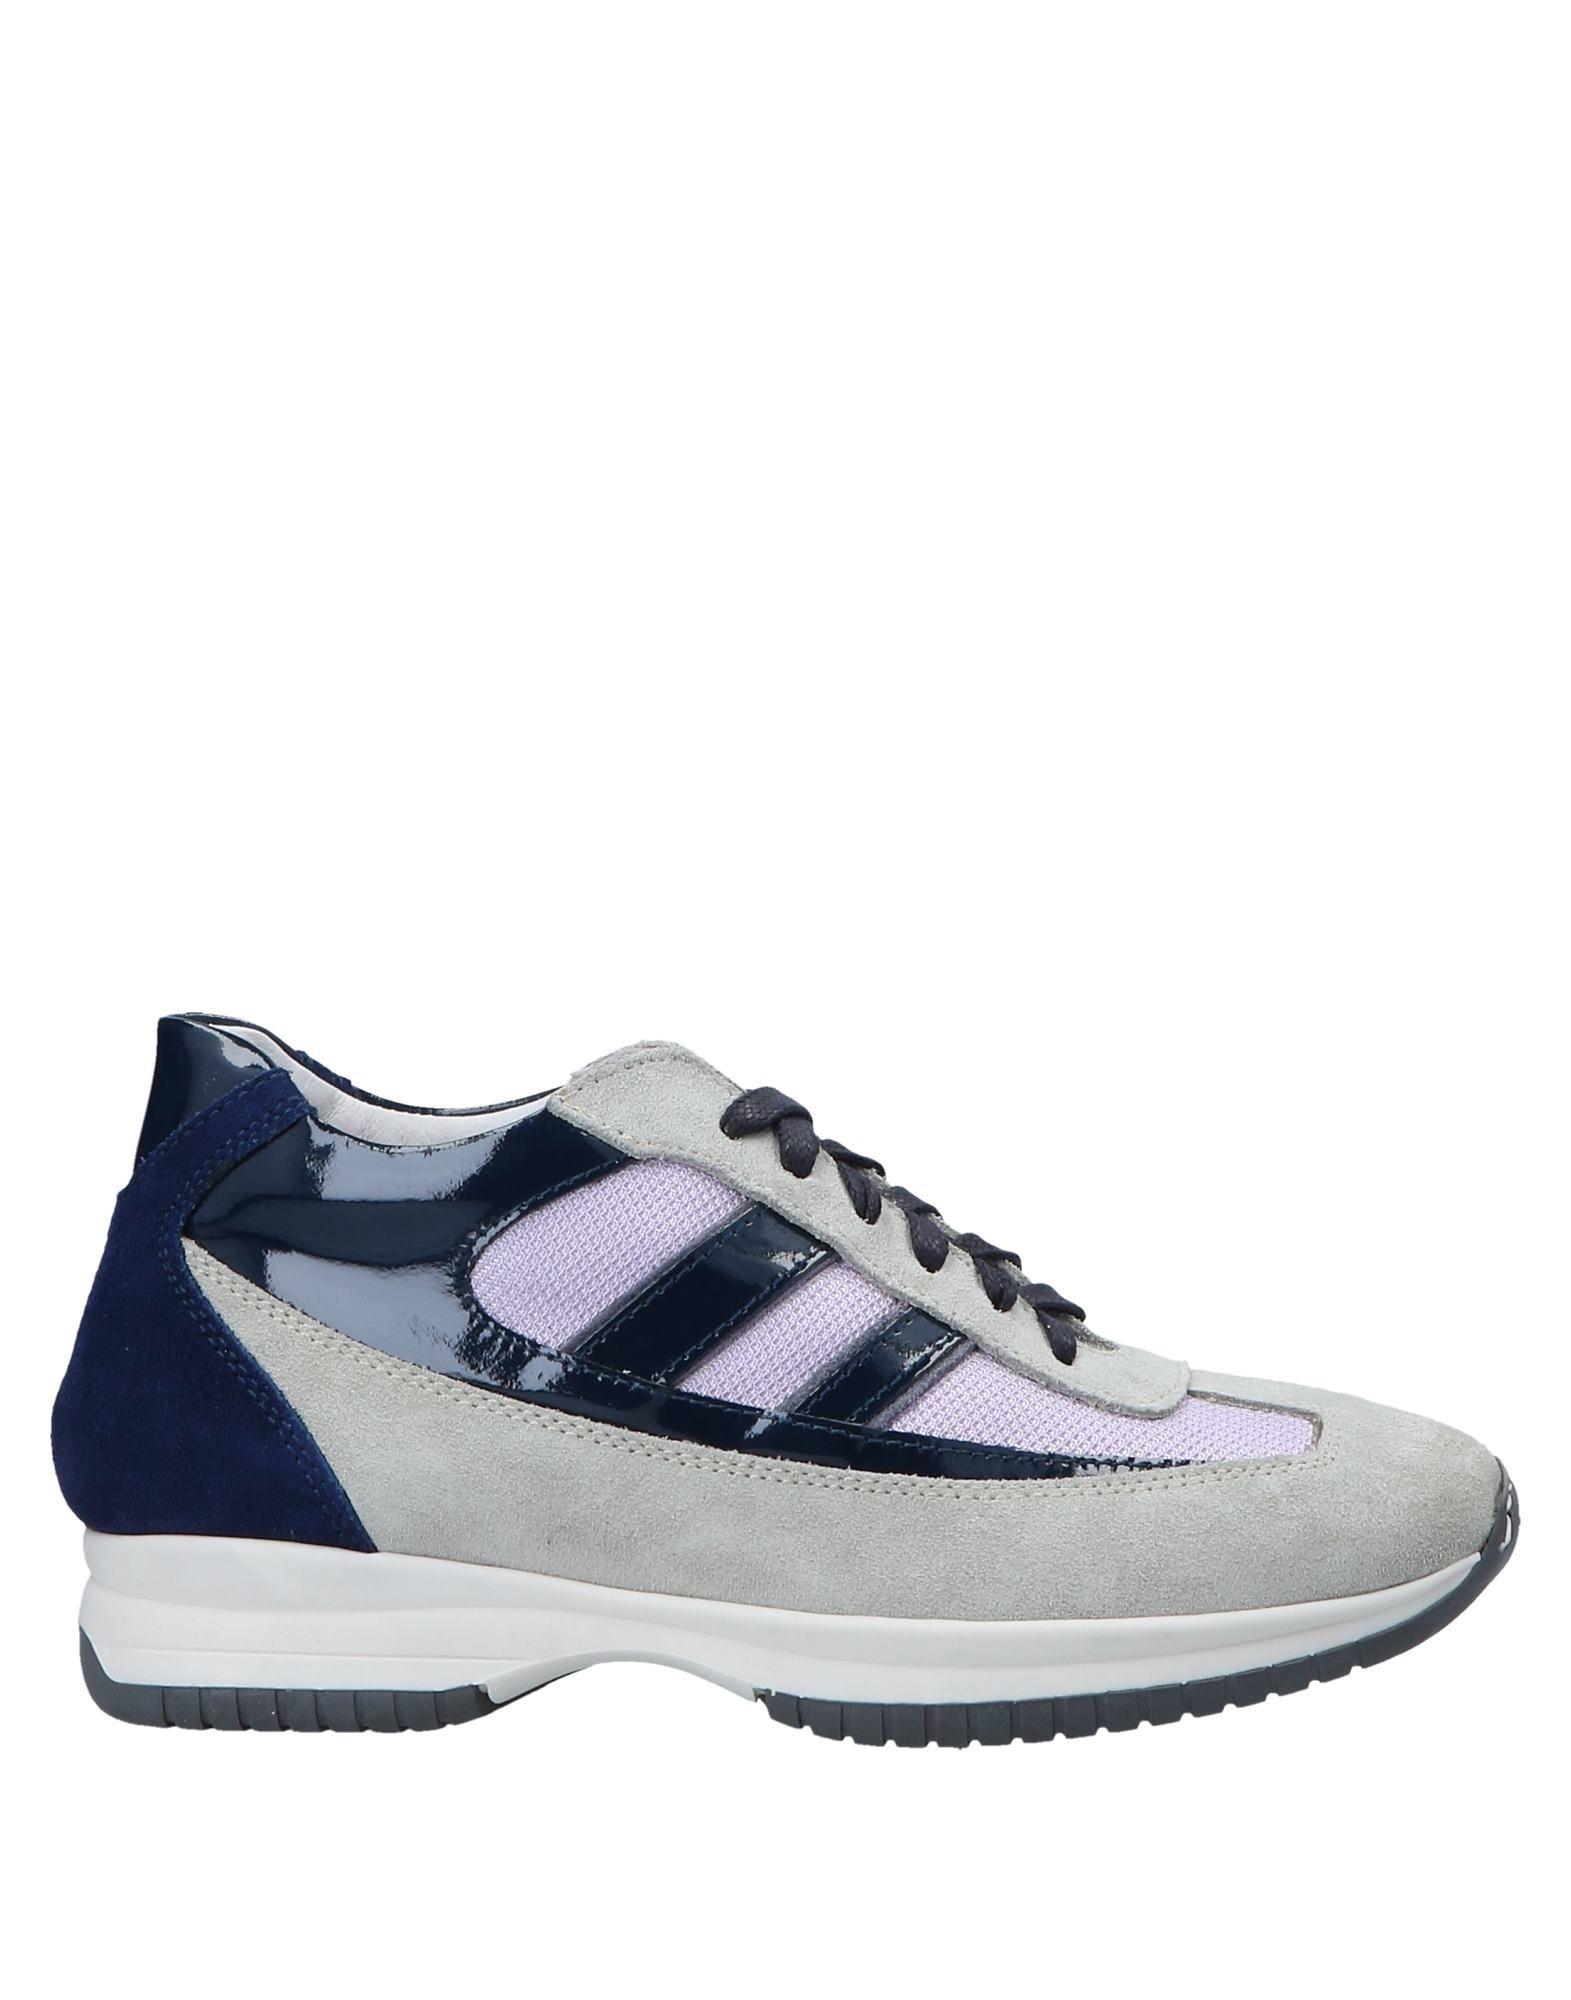 Salvo Barone Gute Sneakers Damen  11547789PI Gute Barone Qualität beliebte Schuhe 9a447d